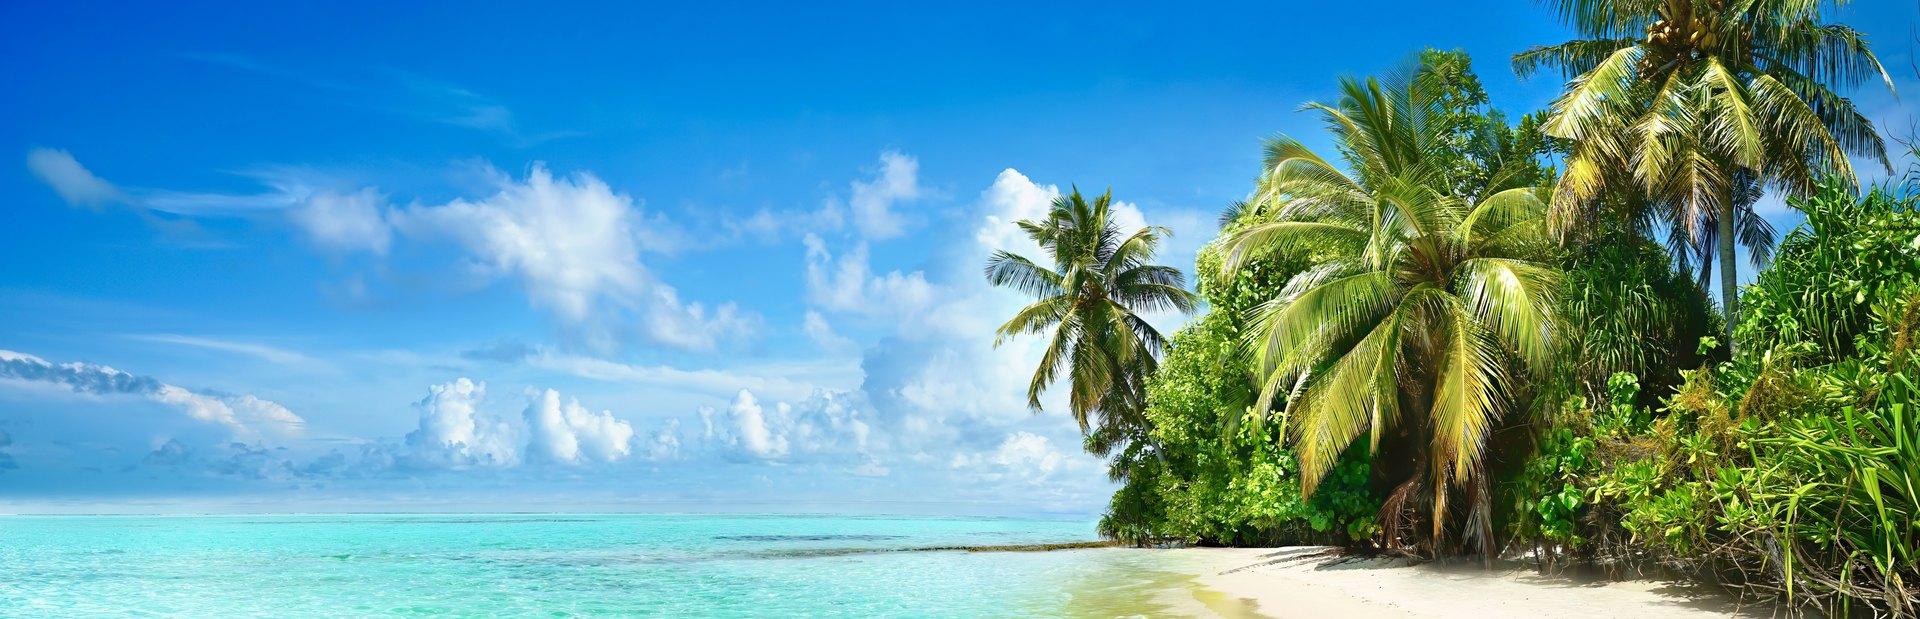 Maldives climate photo